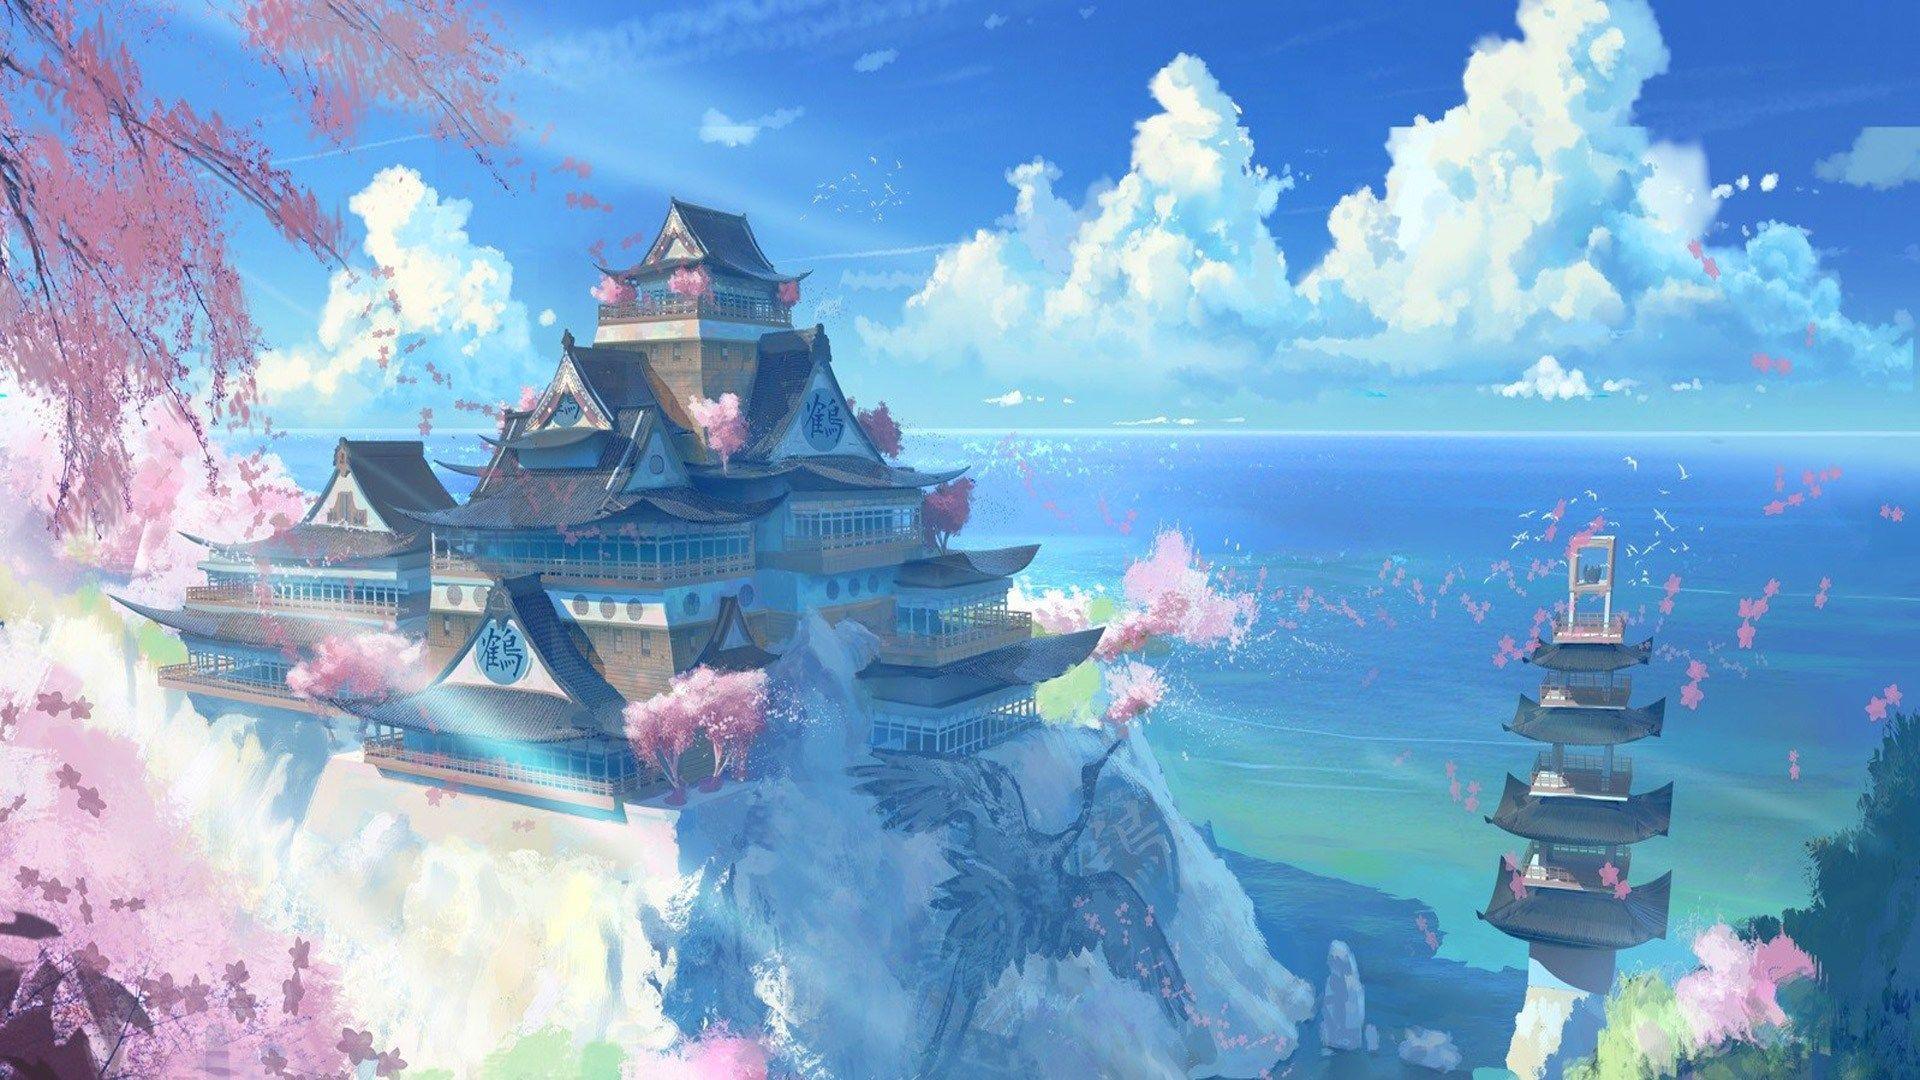 Japan Lo-Fi Wallpapers - Top Free Japan Lo-Fi Backgrounds ...